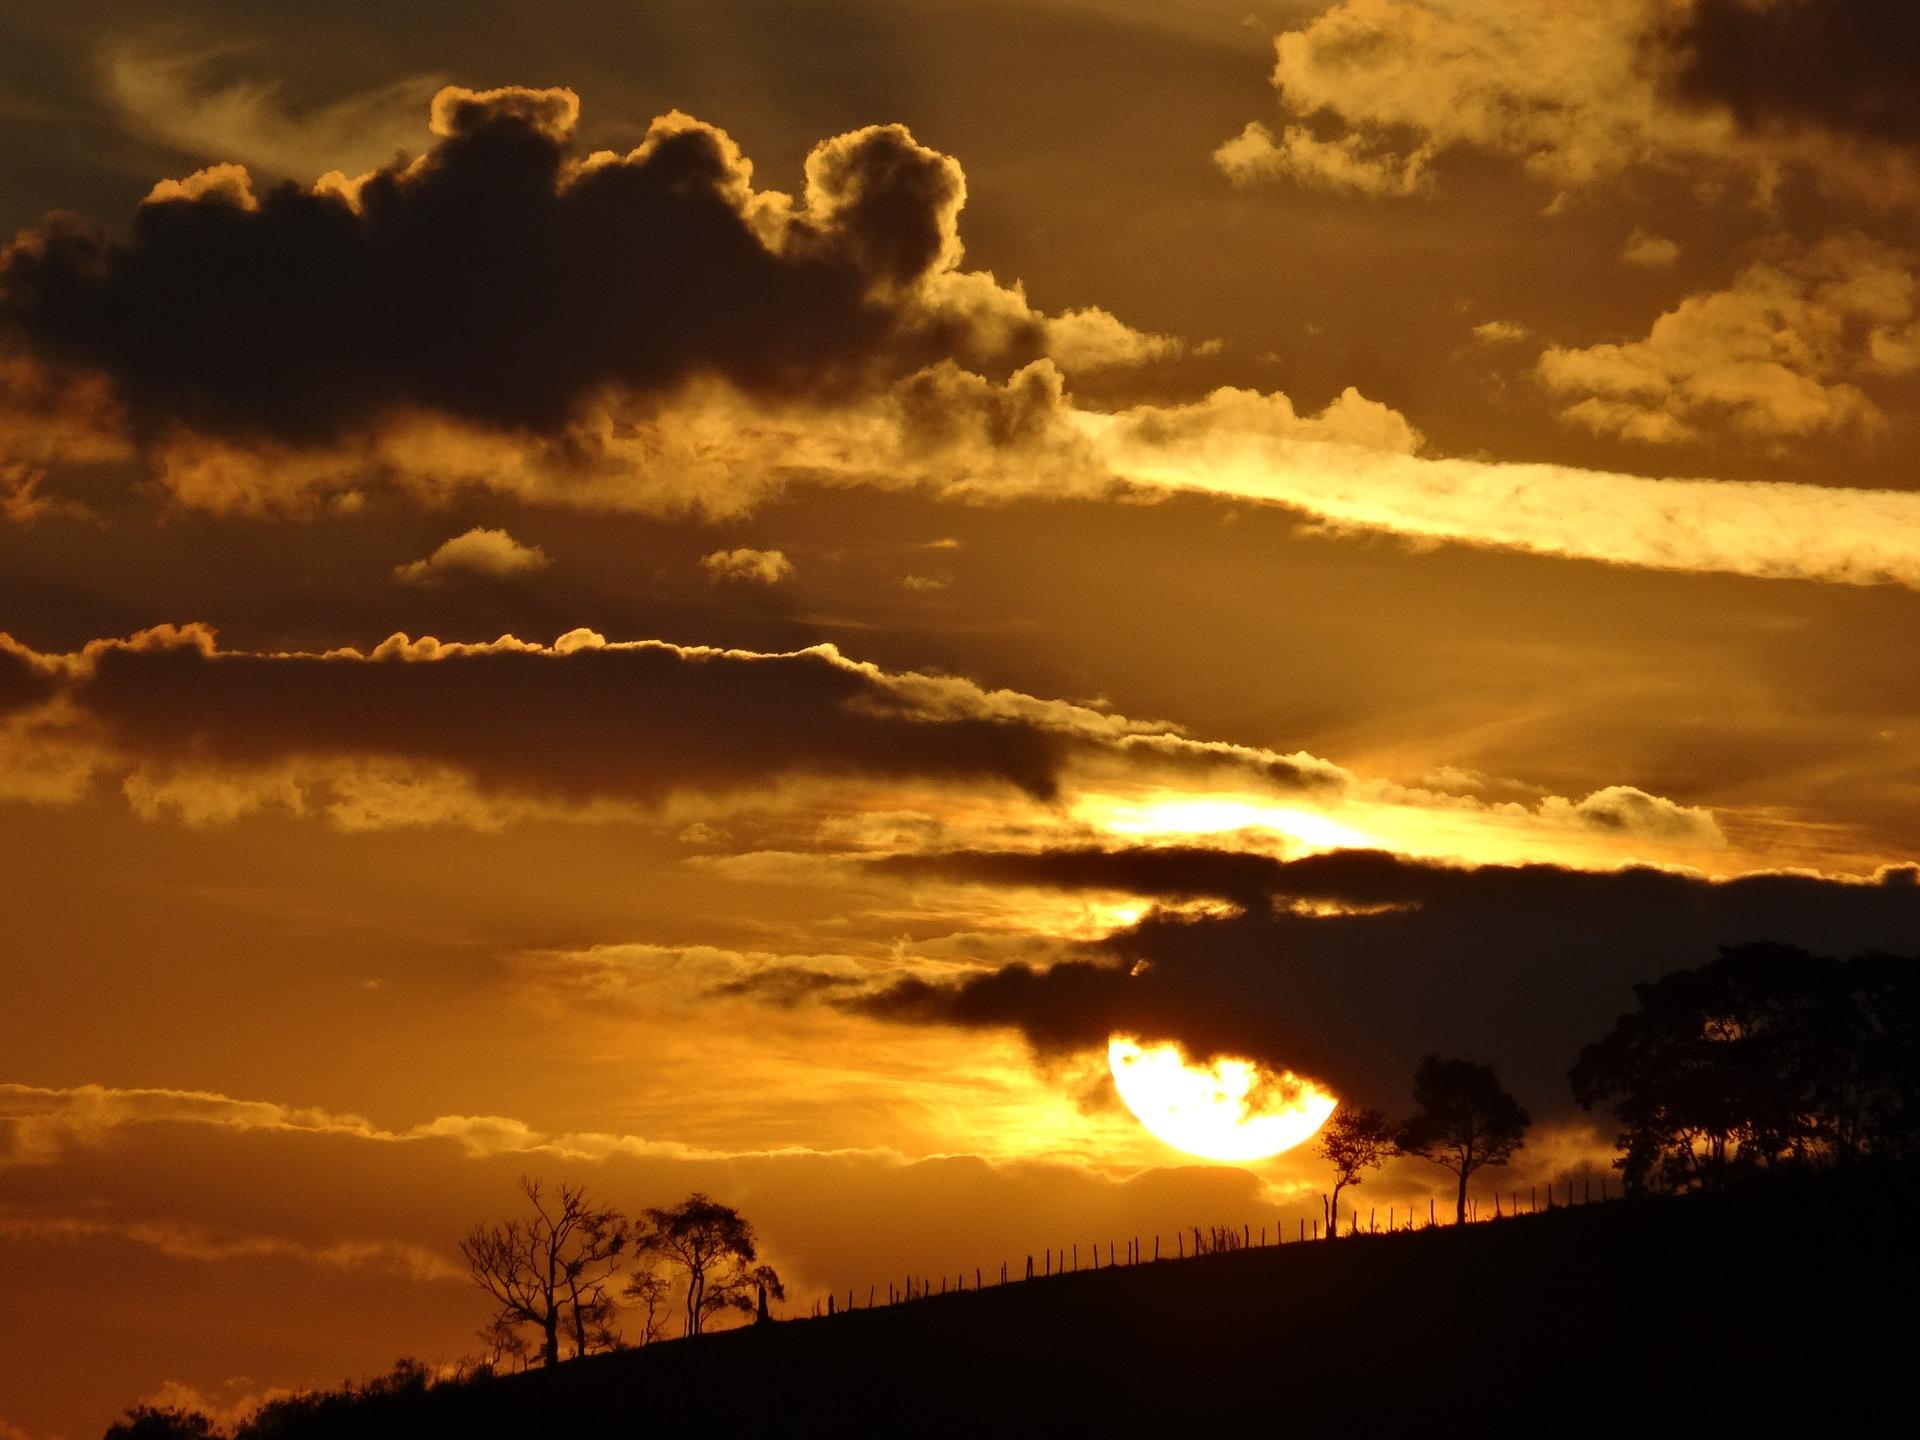 sunset-369498_1920